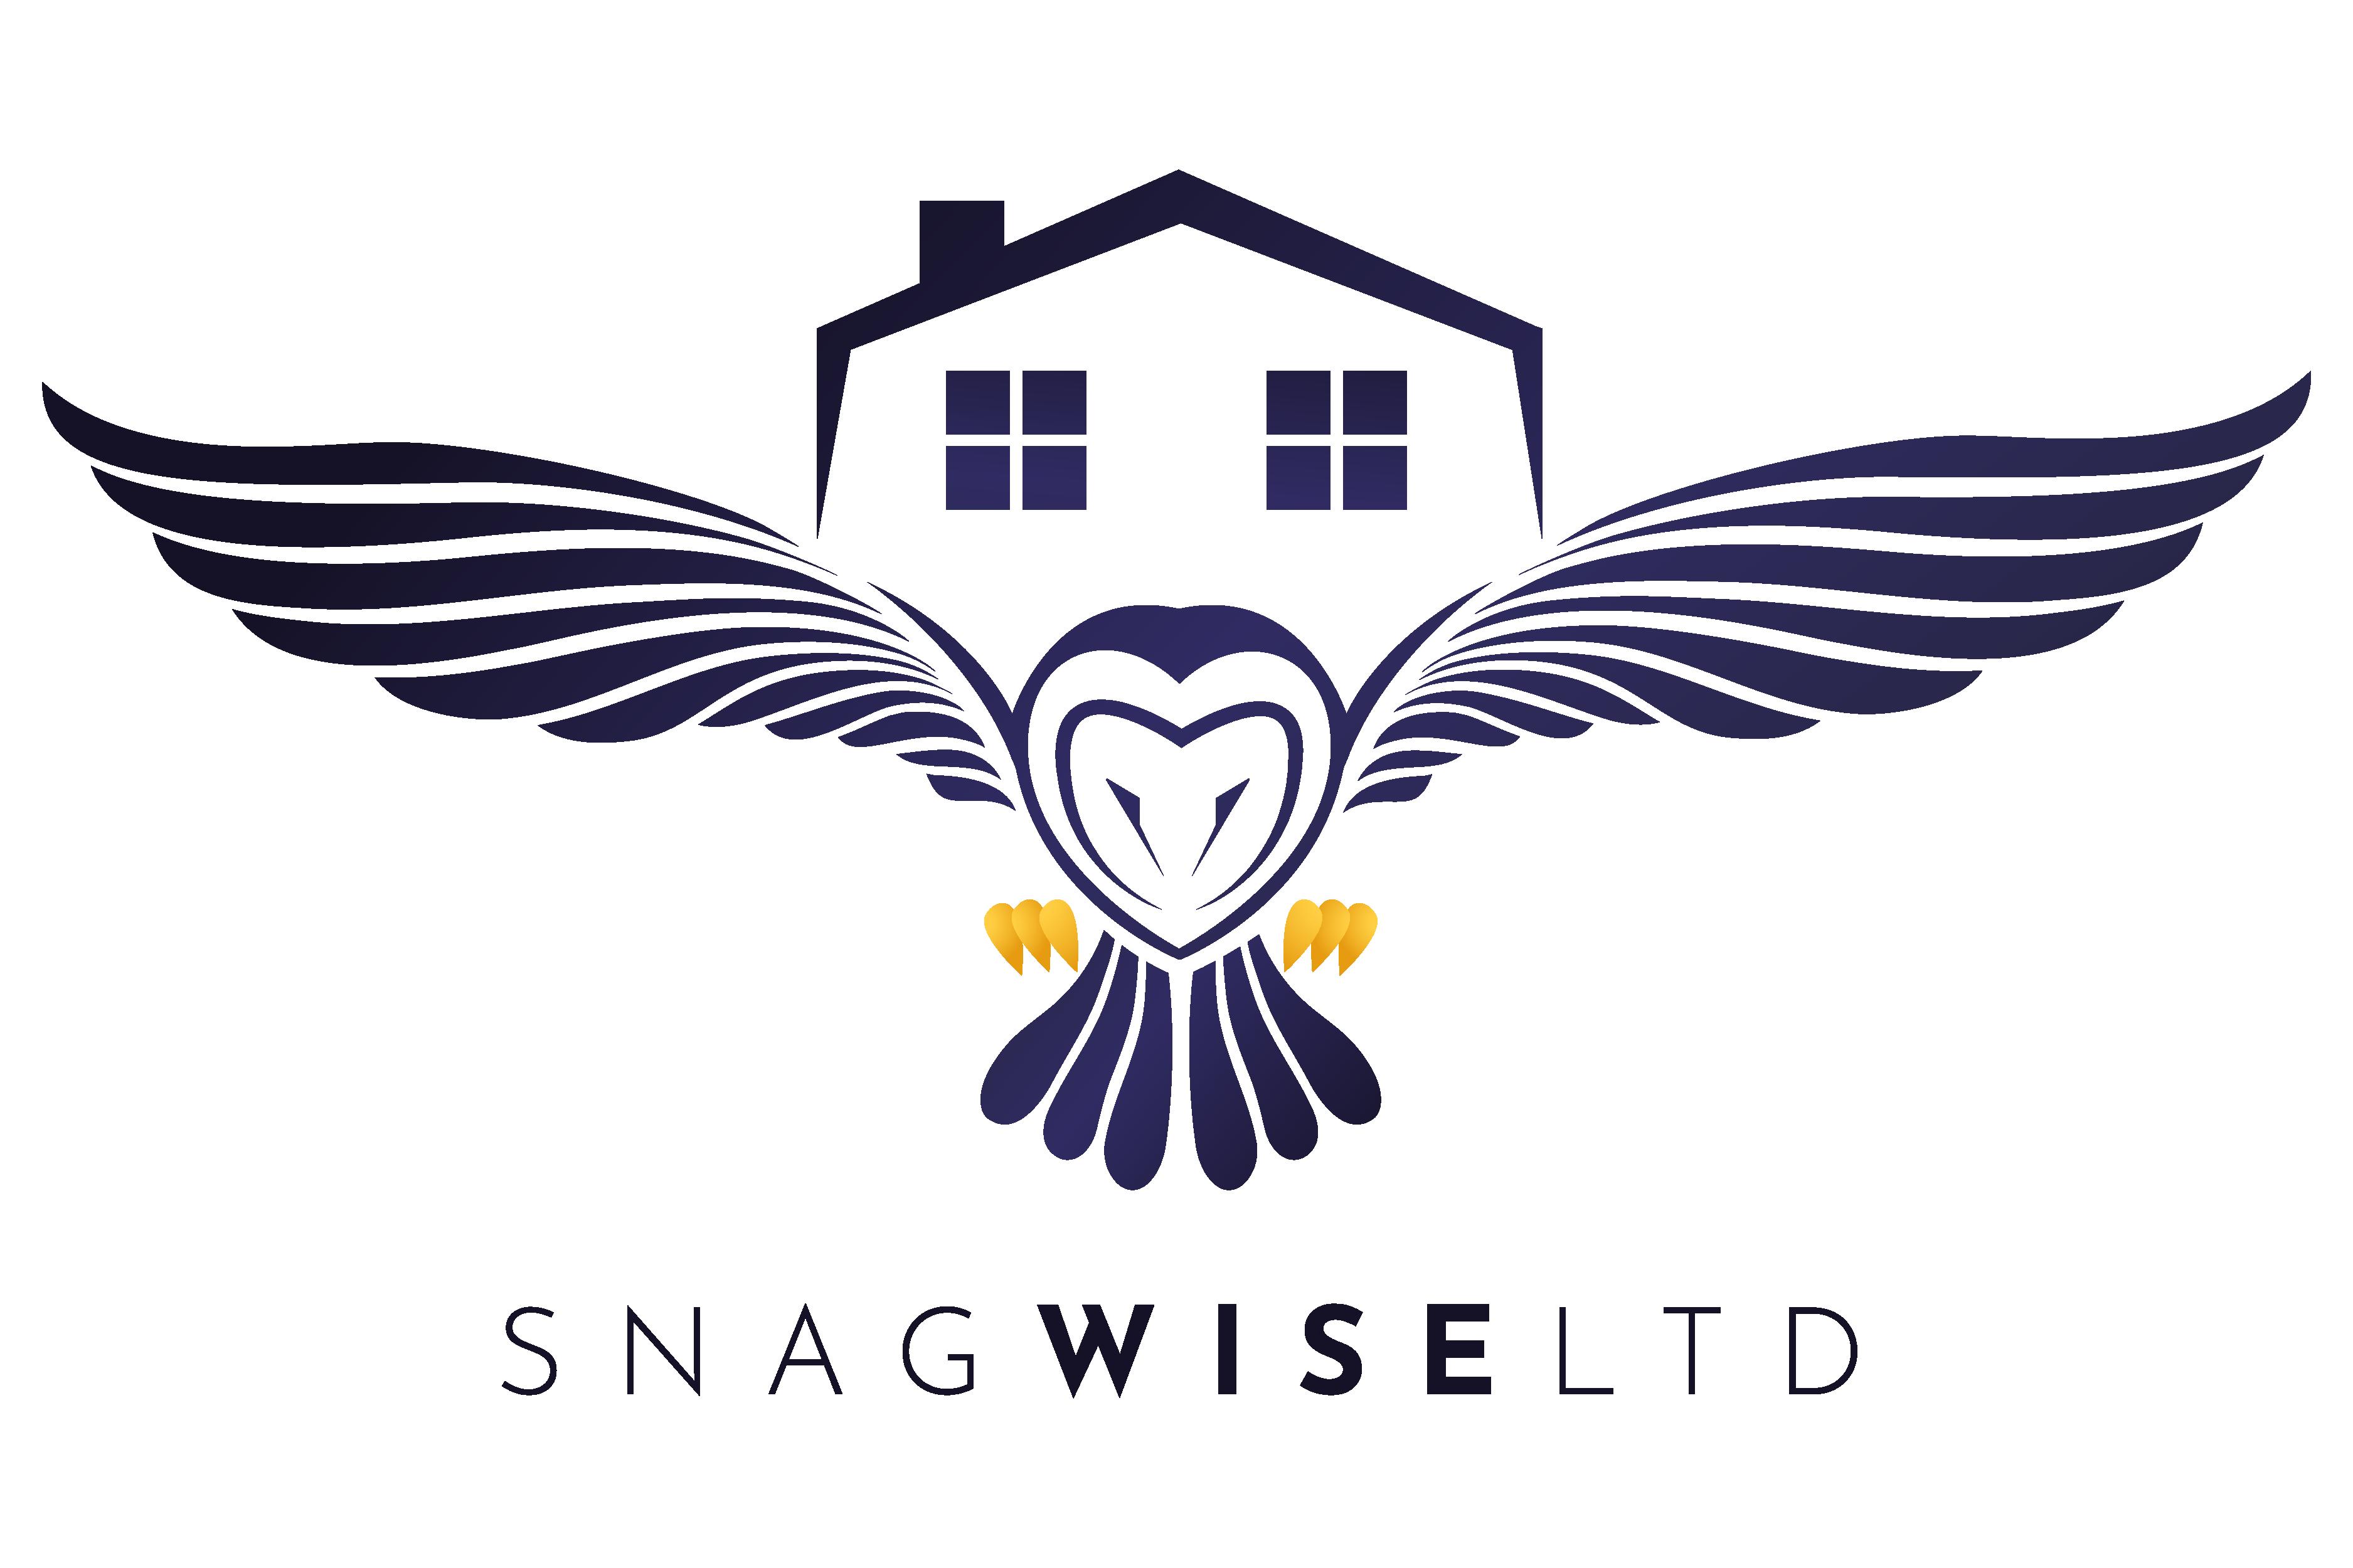 snagwiseltd